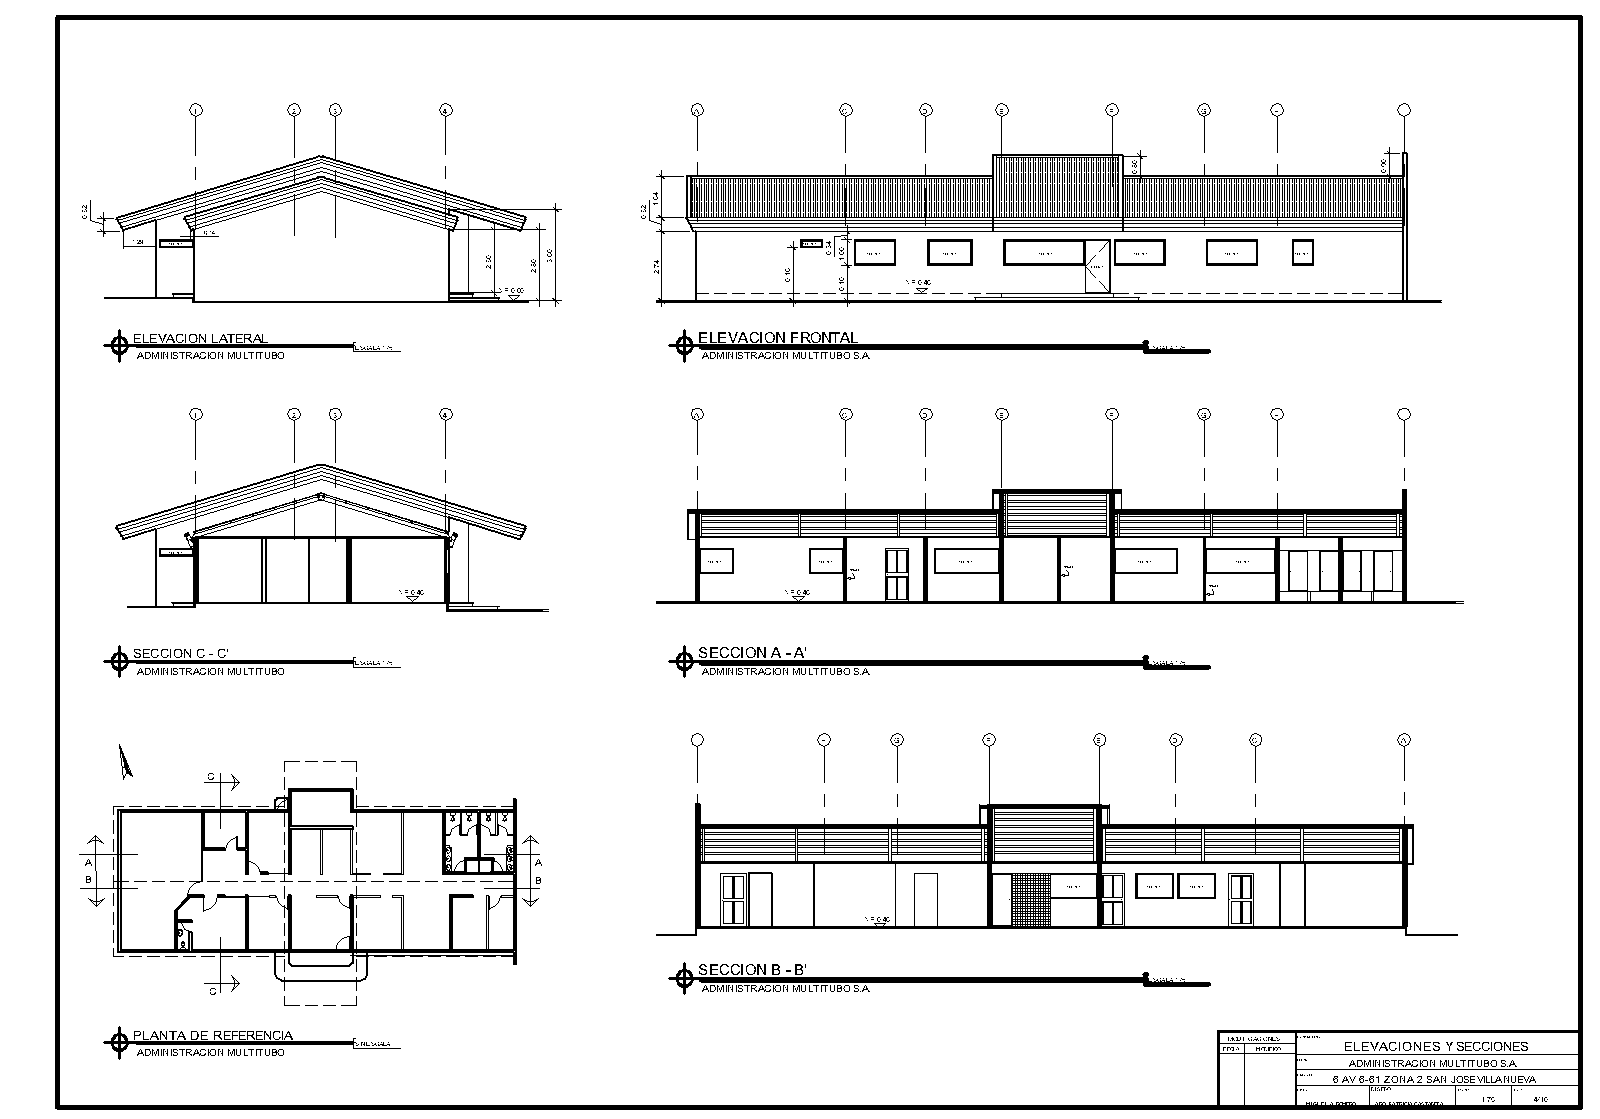 dise o arquitectonico esquema arquitect nico